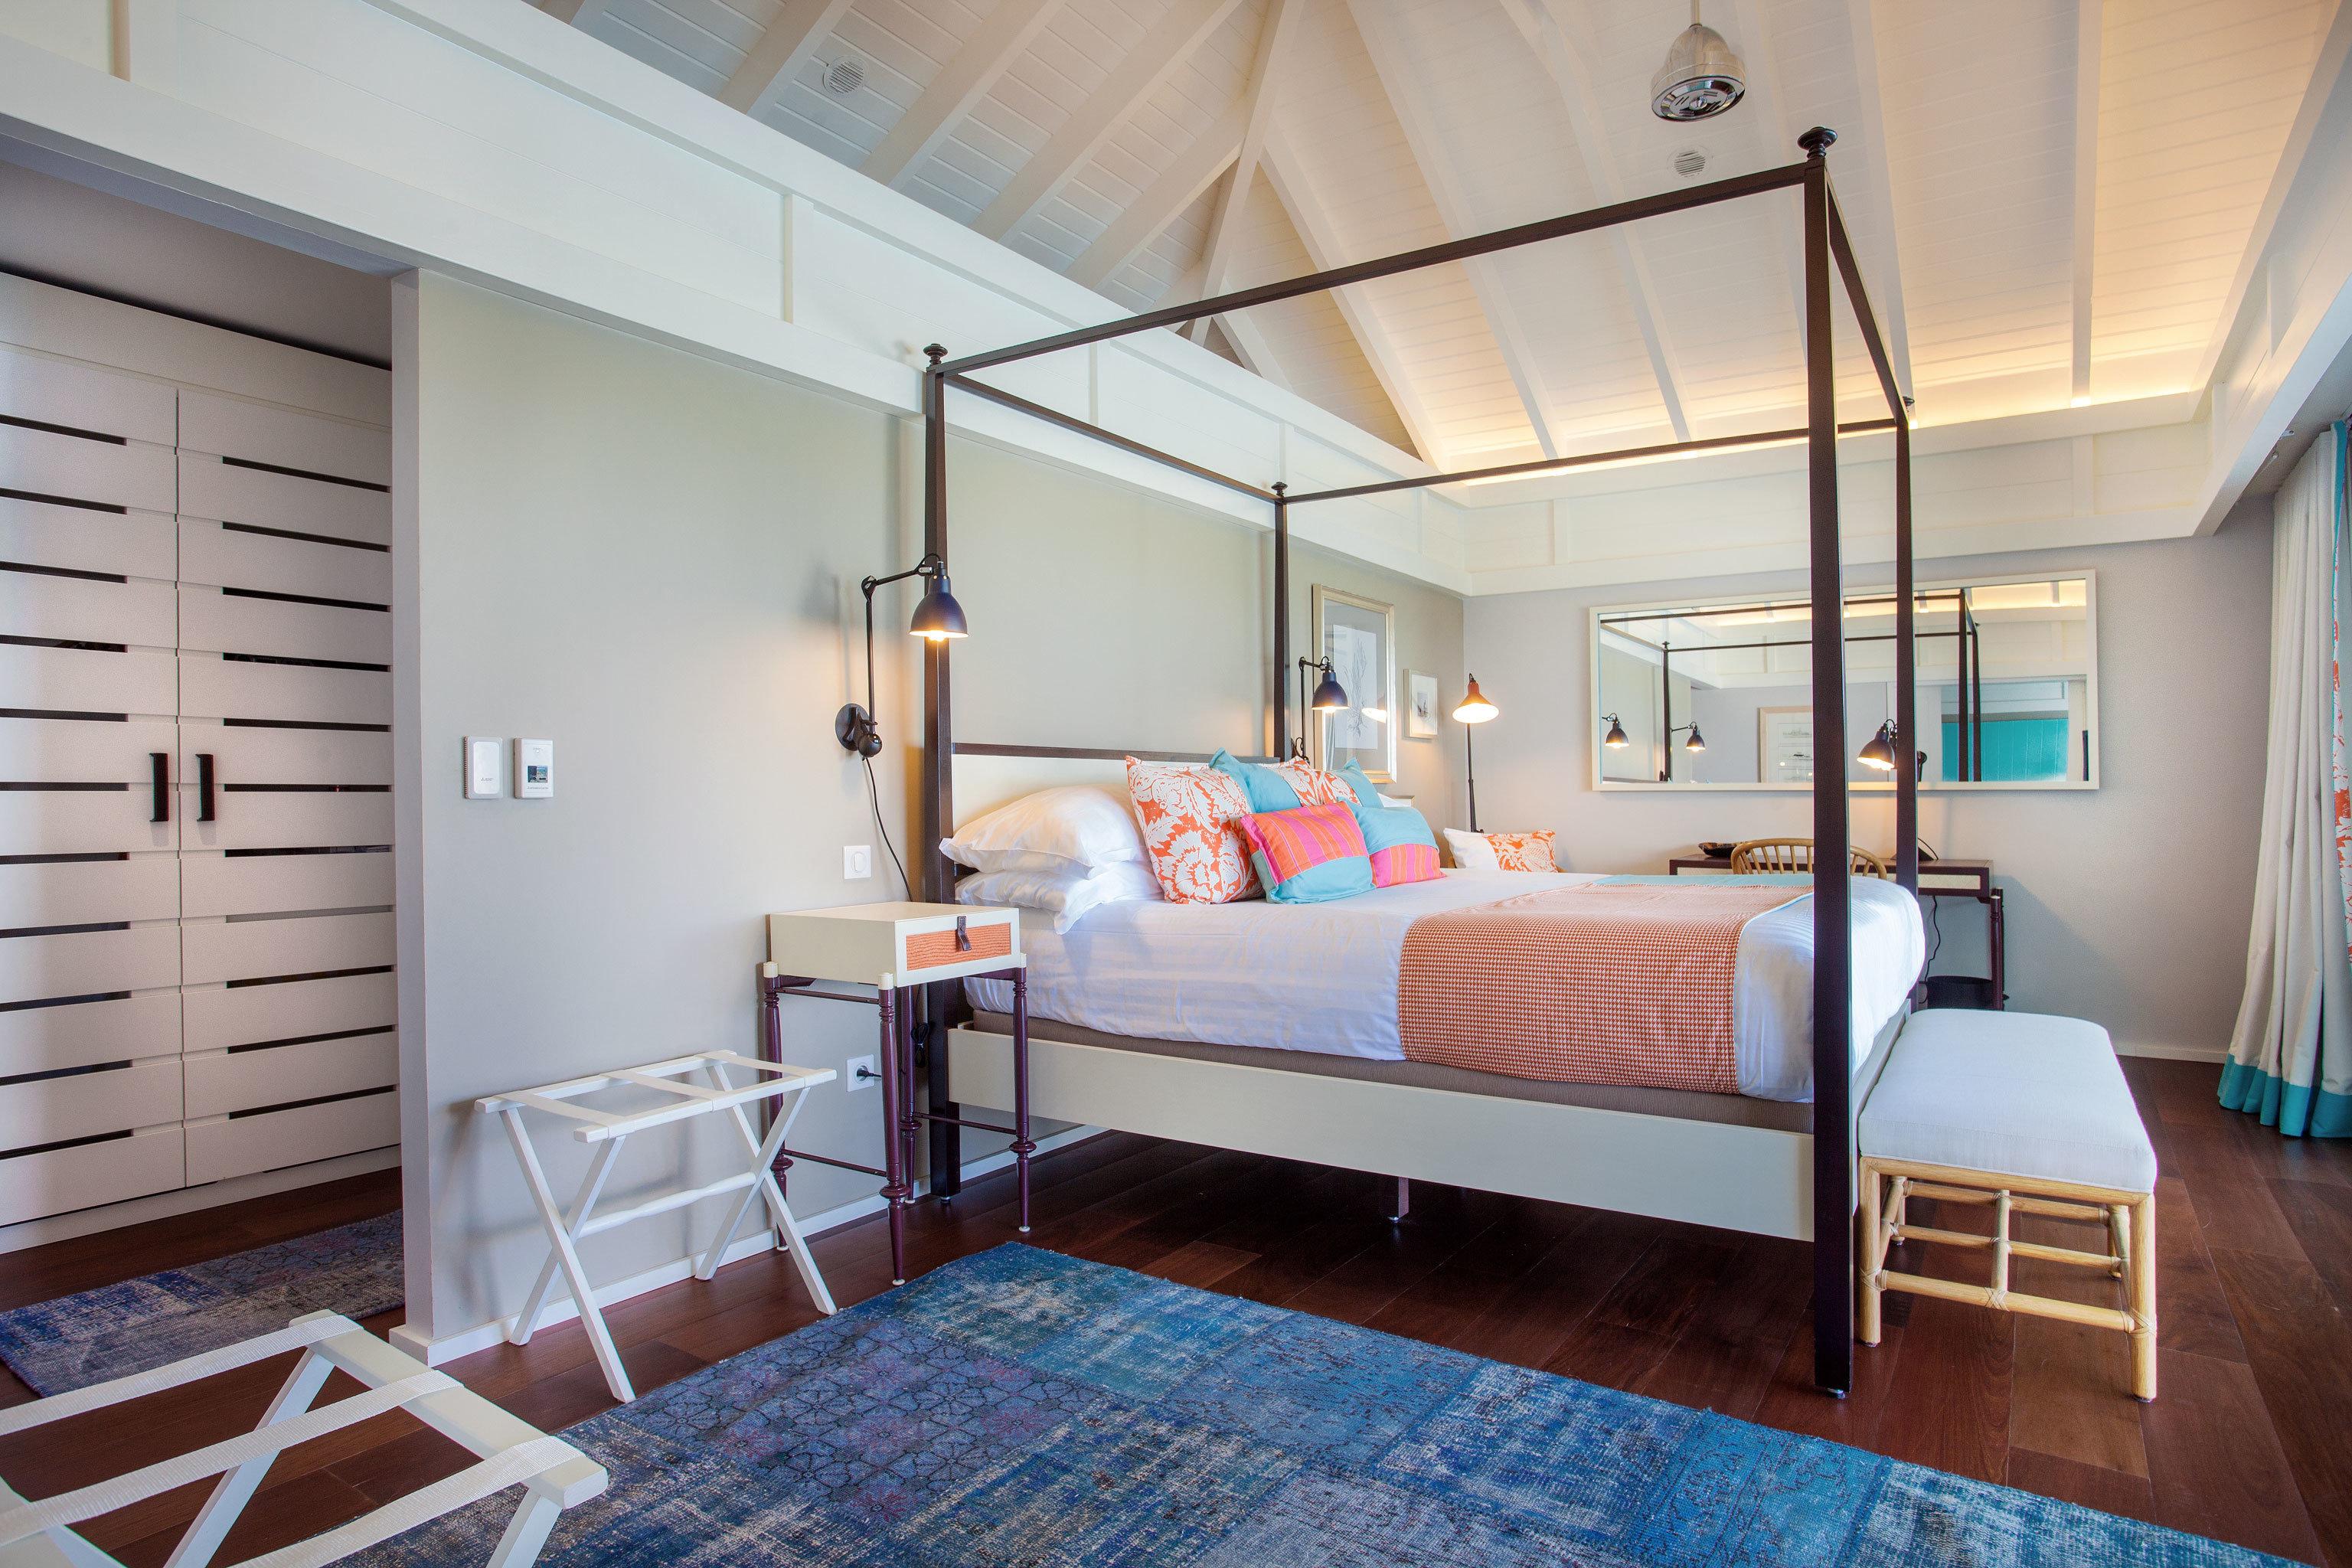 Bedroom Hip Luxury Suite Trip Ideas property living room home cottage condominium loft